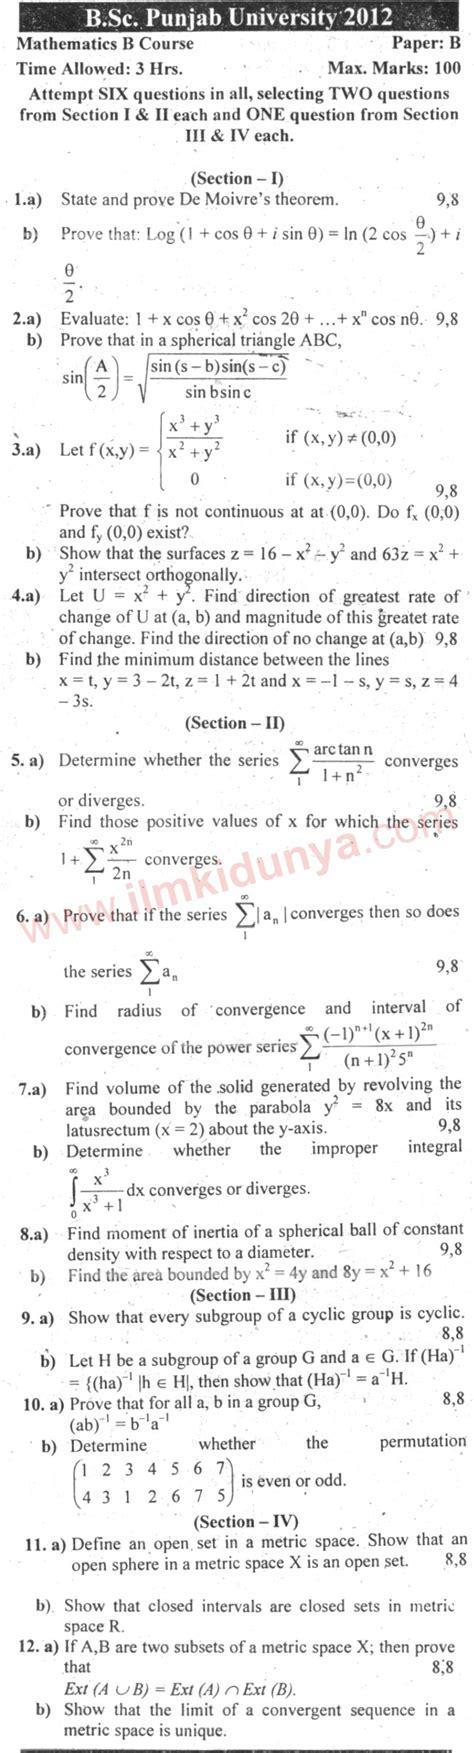 Past Papers 2012 Punjab University BSc Mathematics B ... B-paper